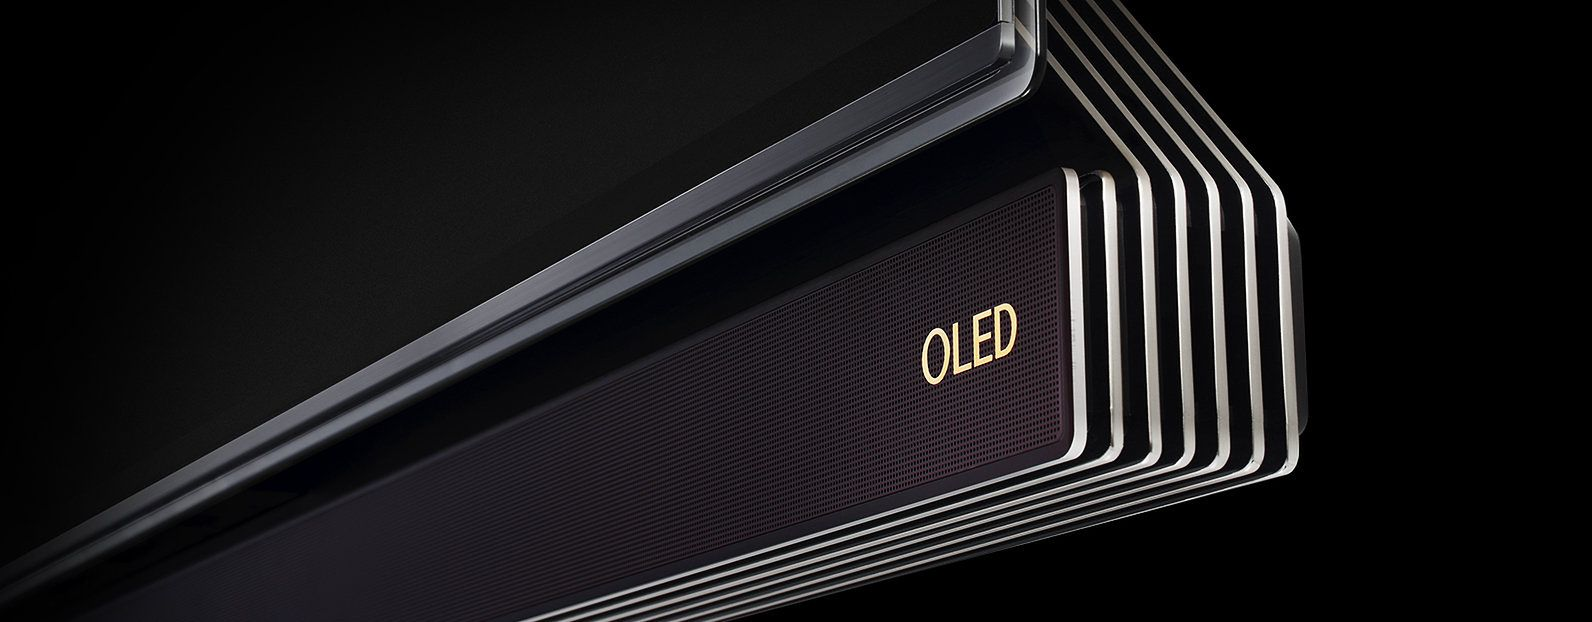 LG SIGNATURE OLED G6 TV